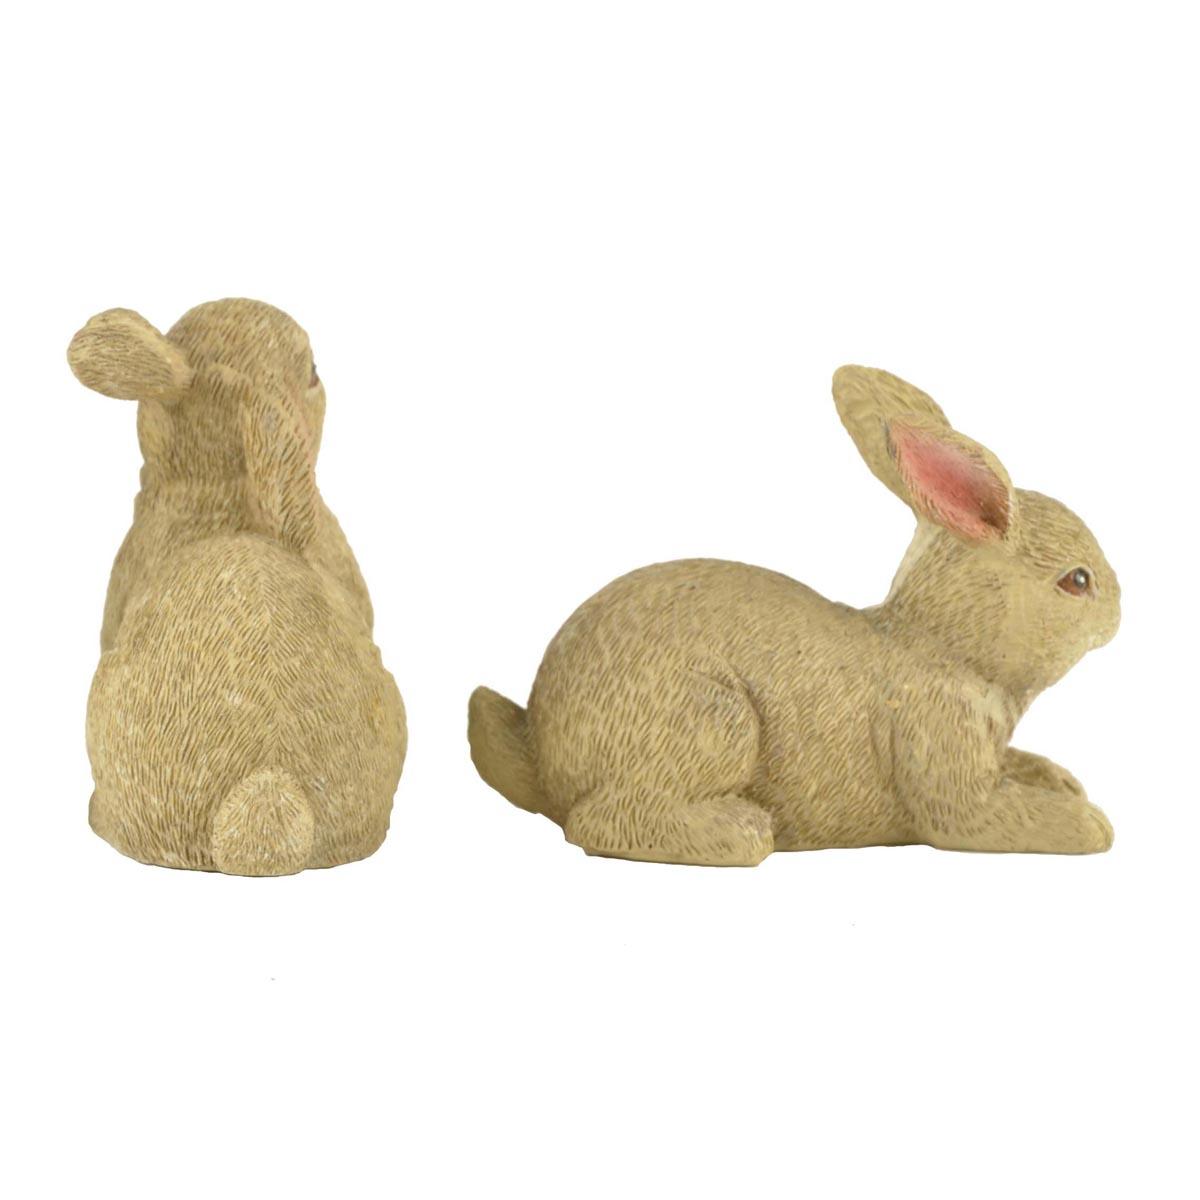 Ennas easter rabbit statues polyresin micro landscape-2